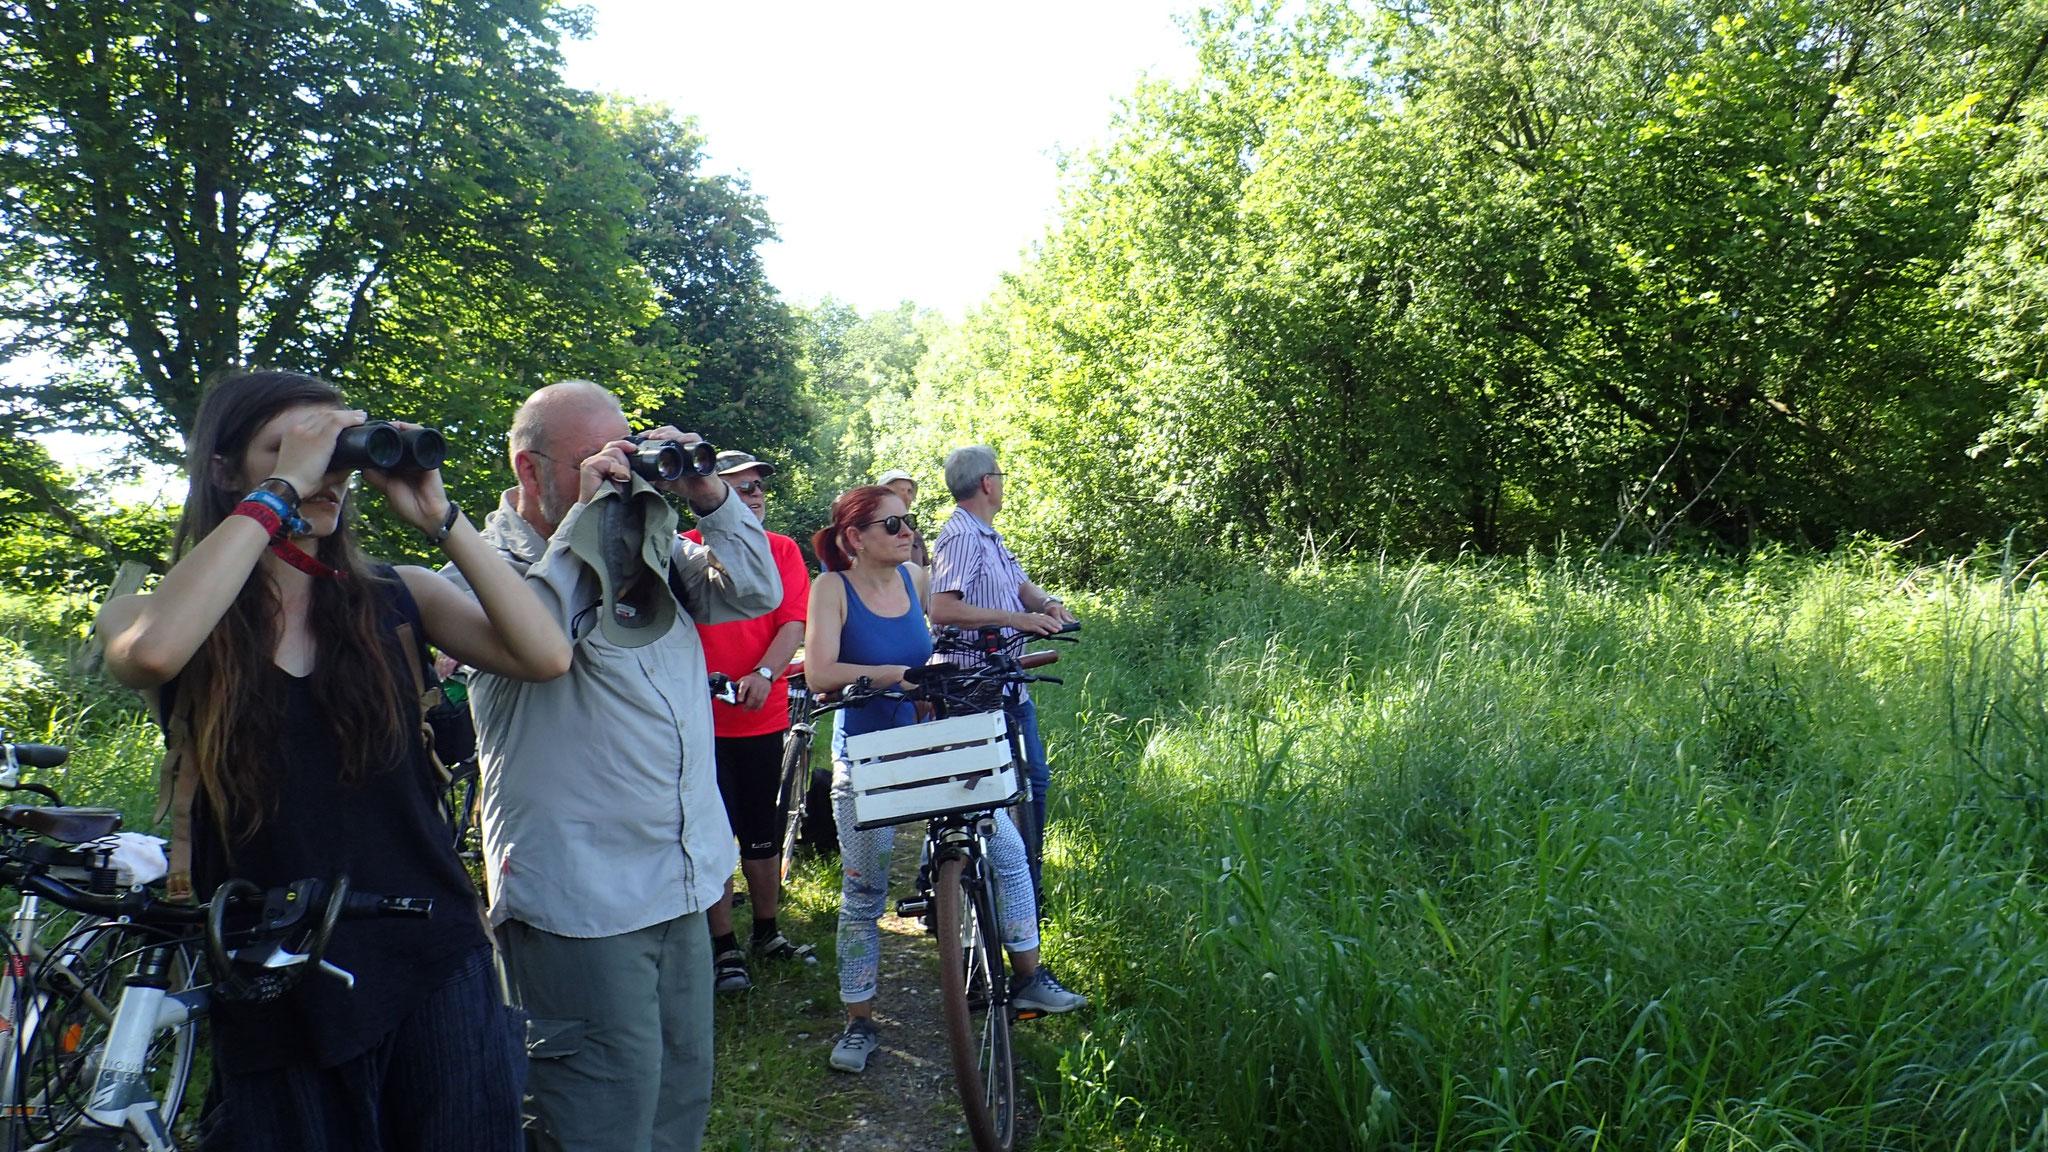 Botanisch-Ornithologische Fahrrad-Exkursion. Foto: ÖNSA/N.Feige